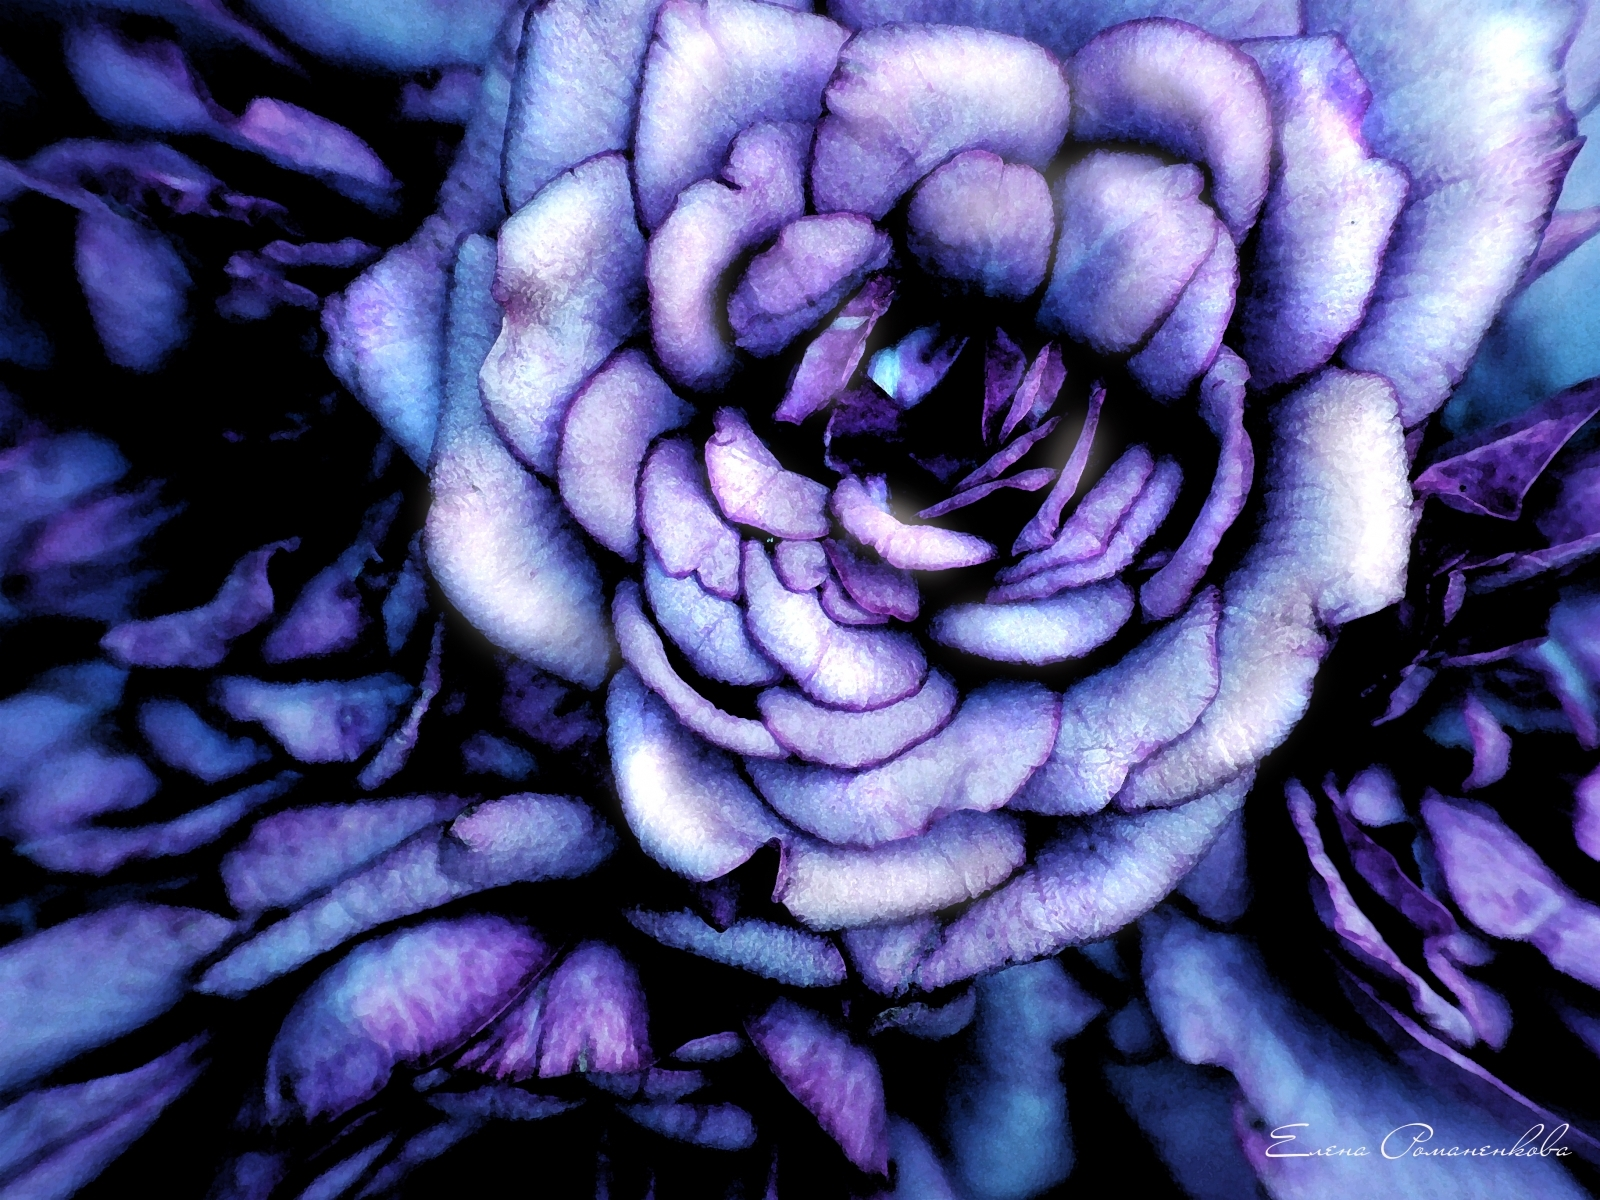 10039 descargar fondo de pantalla Plantas, Flores, Roses, Imágenes: protectores de pantalla e imágenes gratis